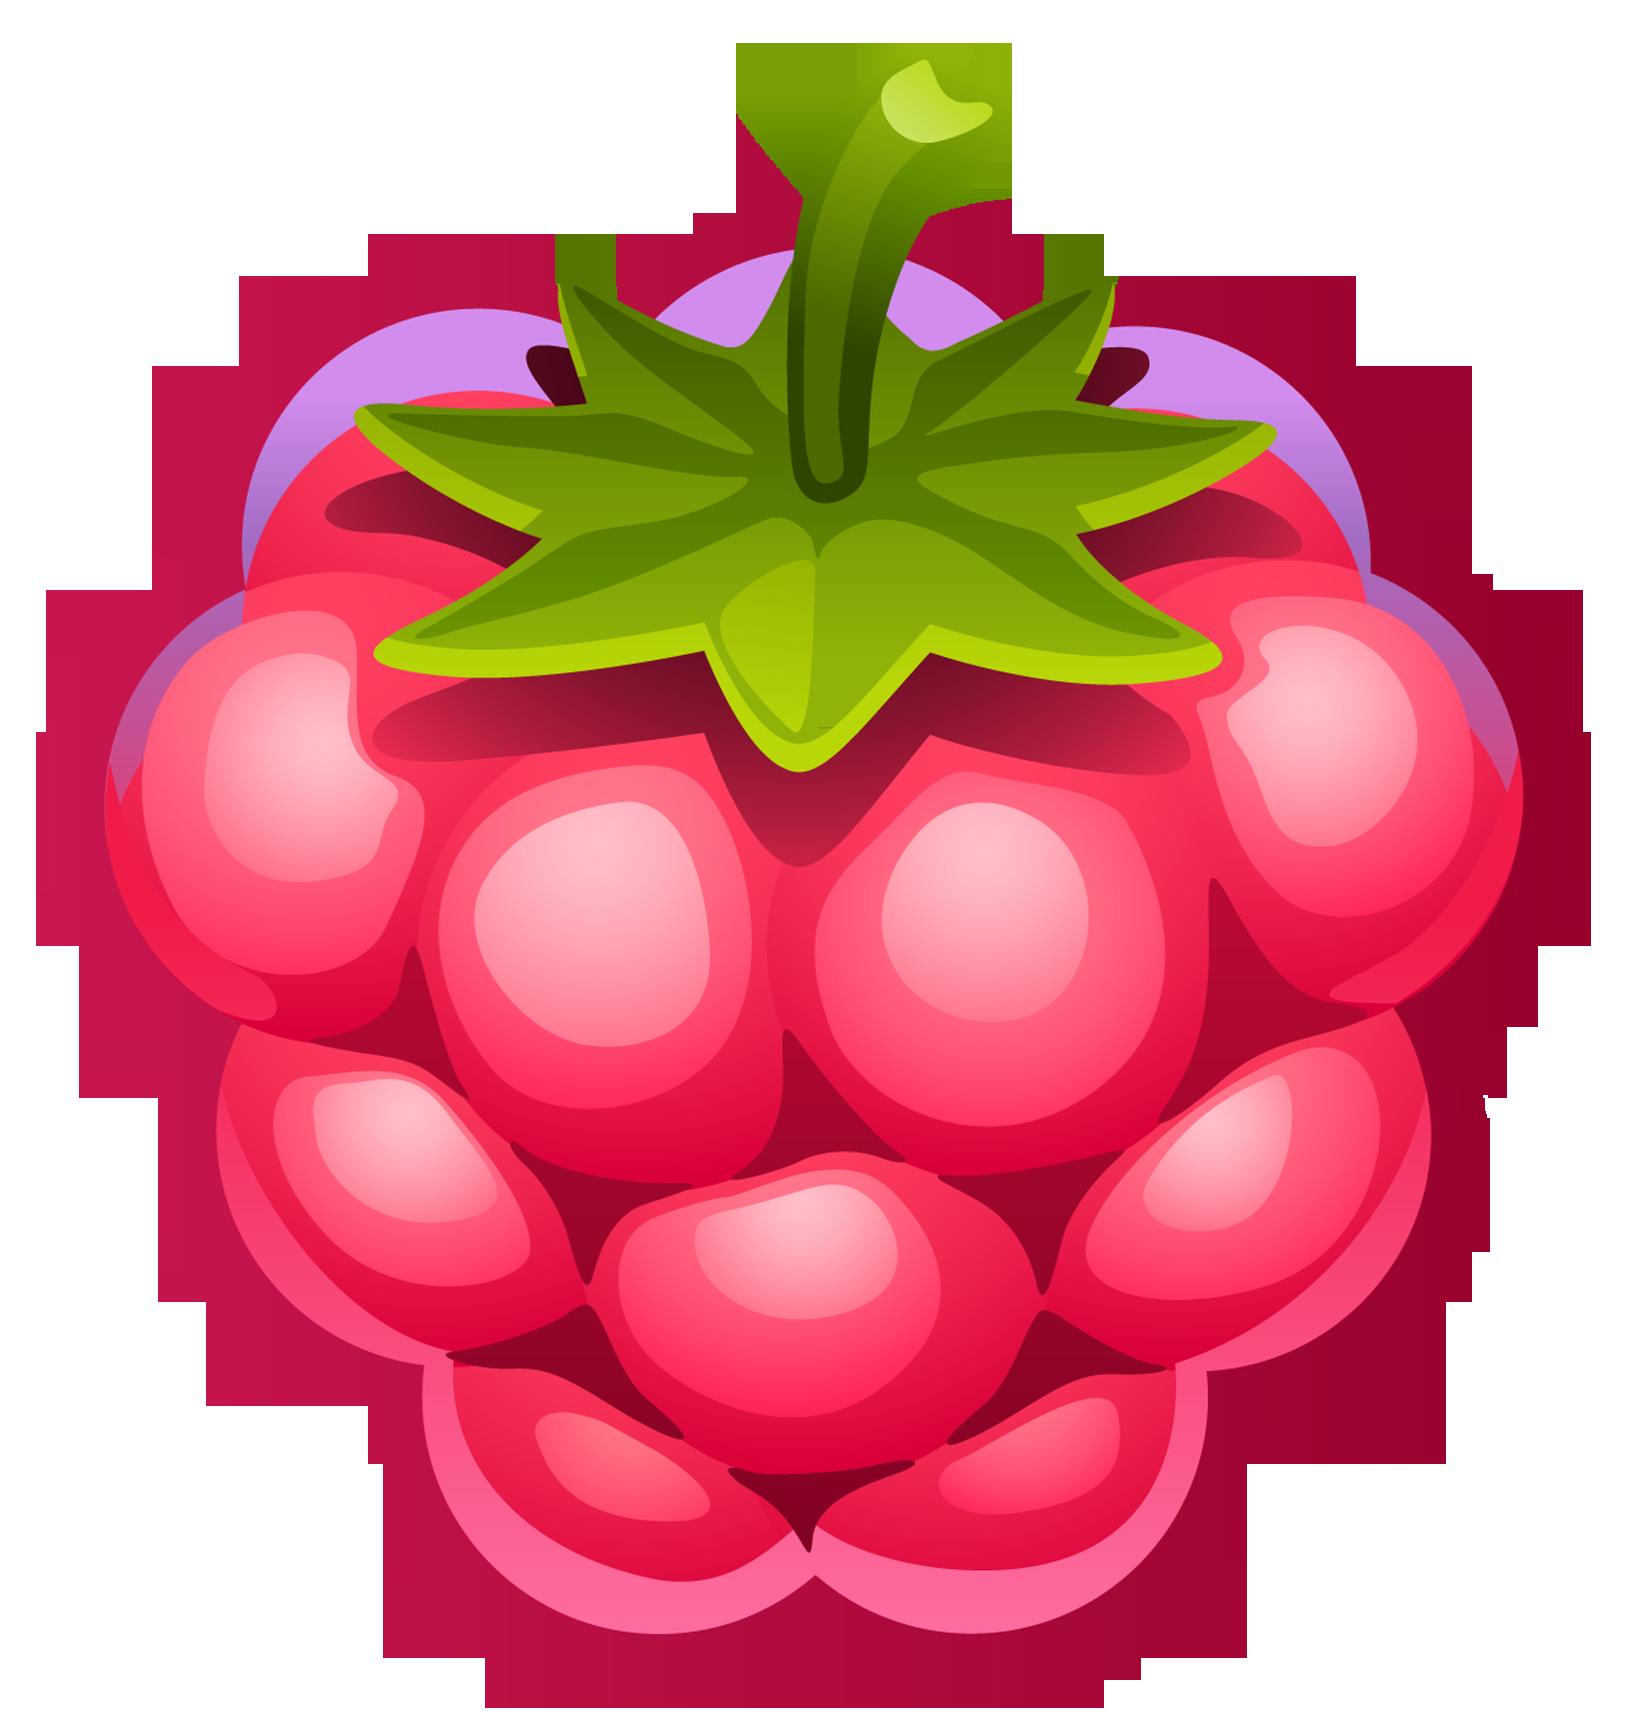 Raspberry Clipart #1